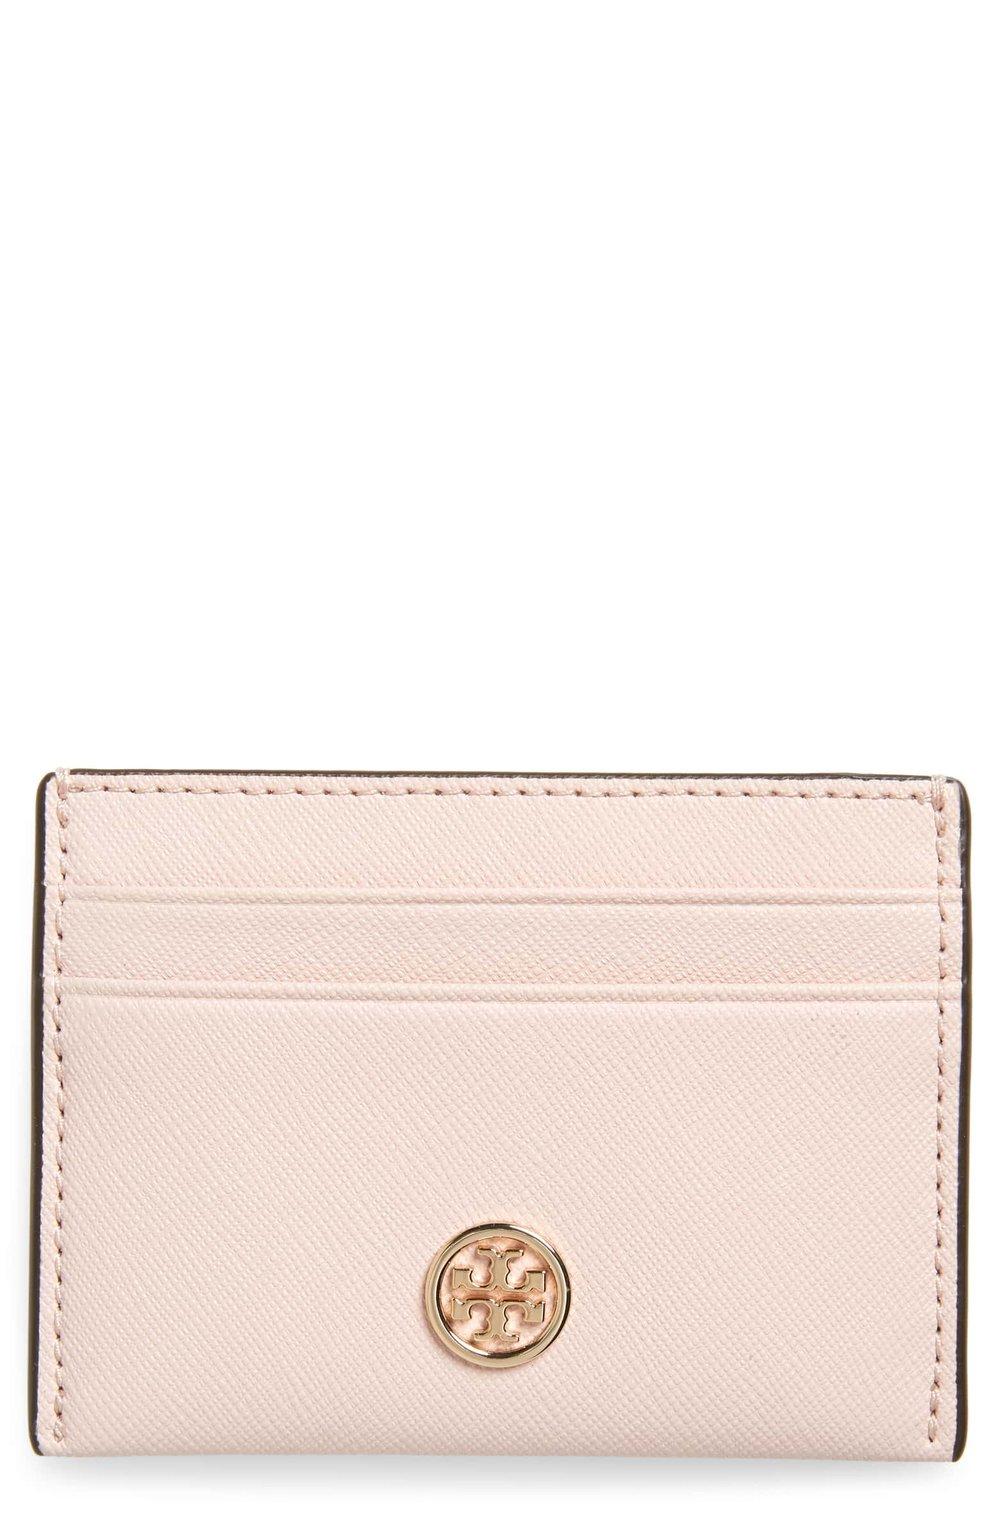 blush tory burch card case.jpg